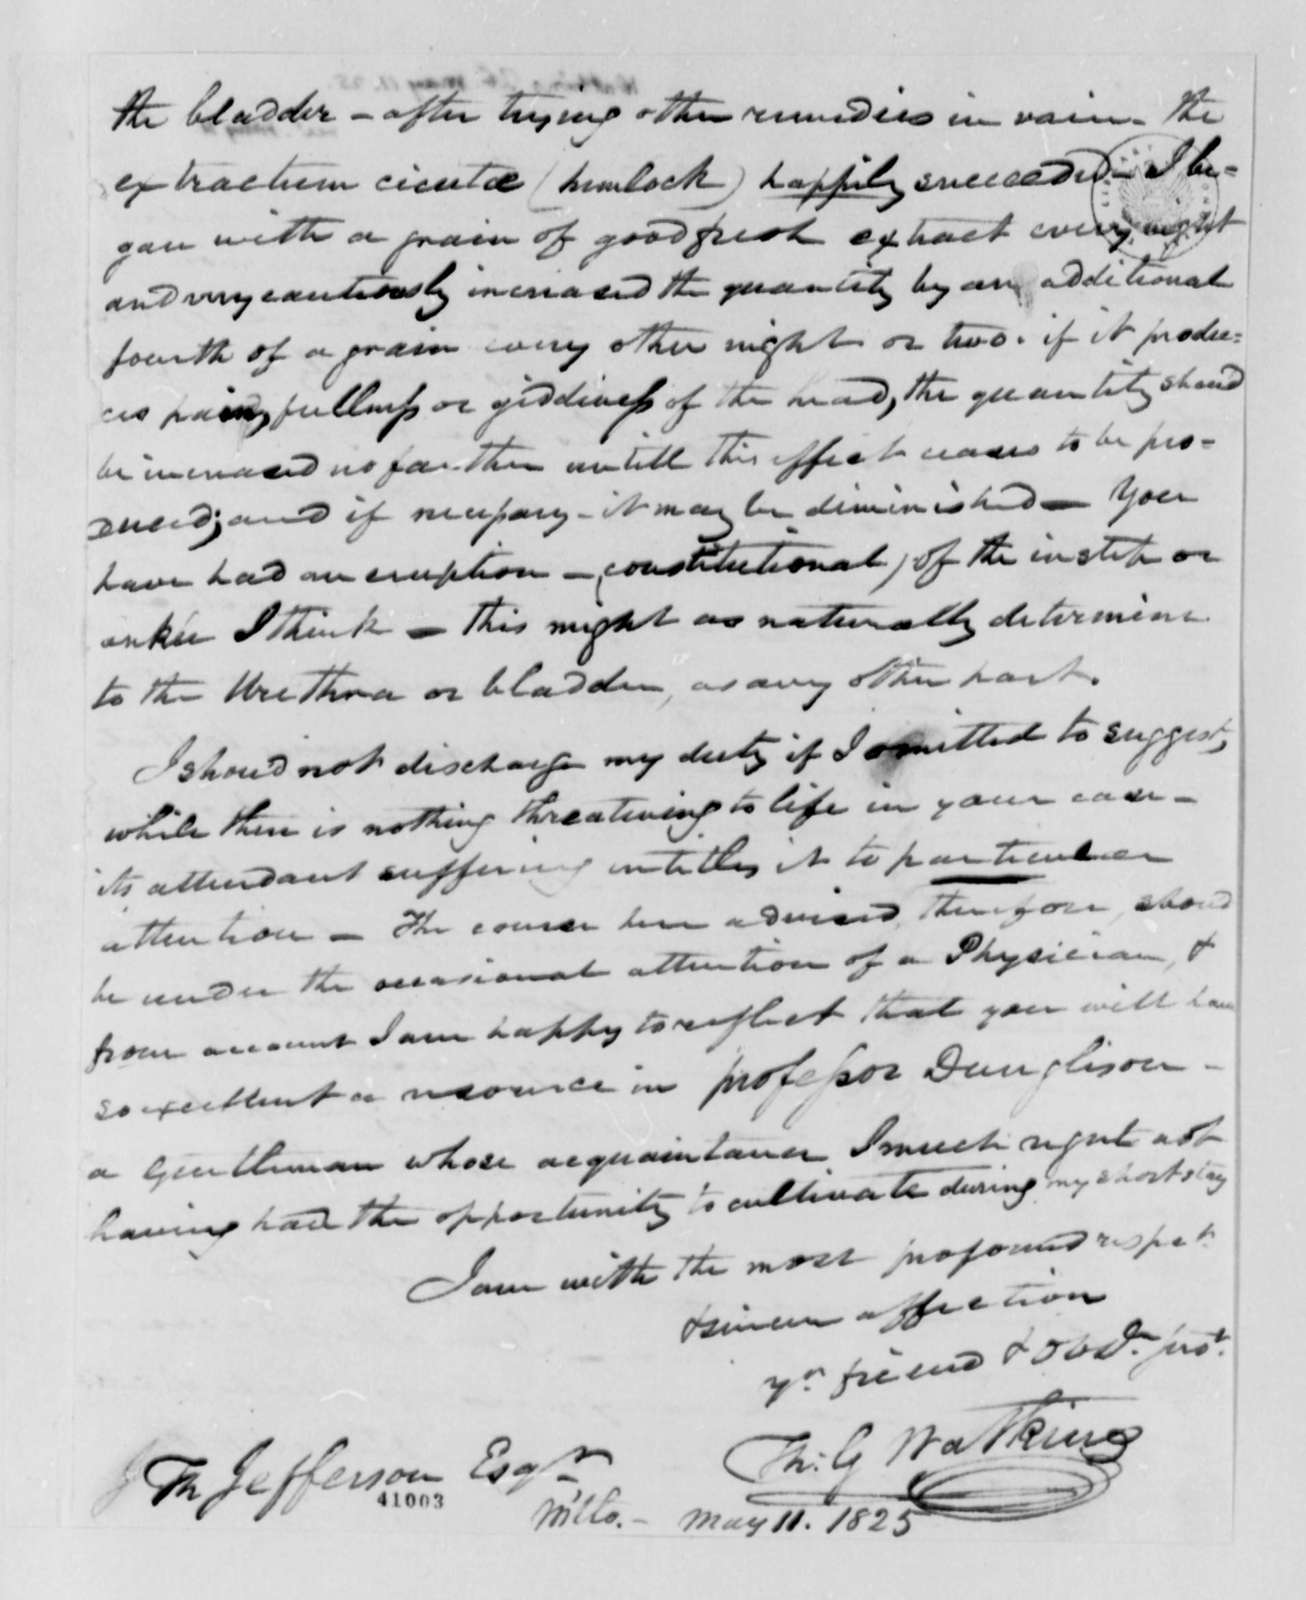 Thomas G. Watkins to Thomas Jefferson, May 11, 1825